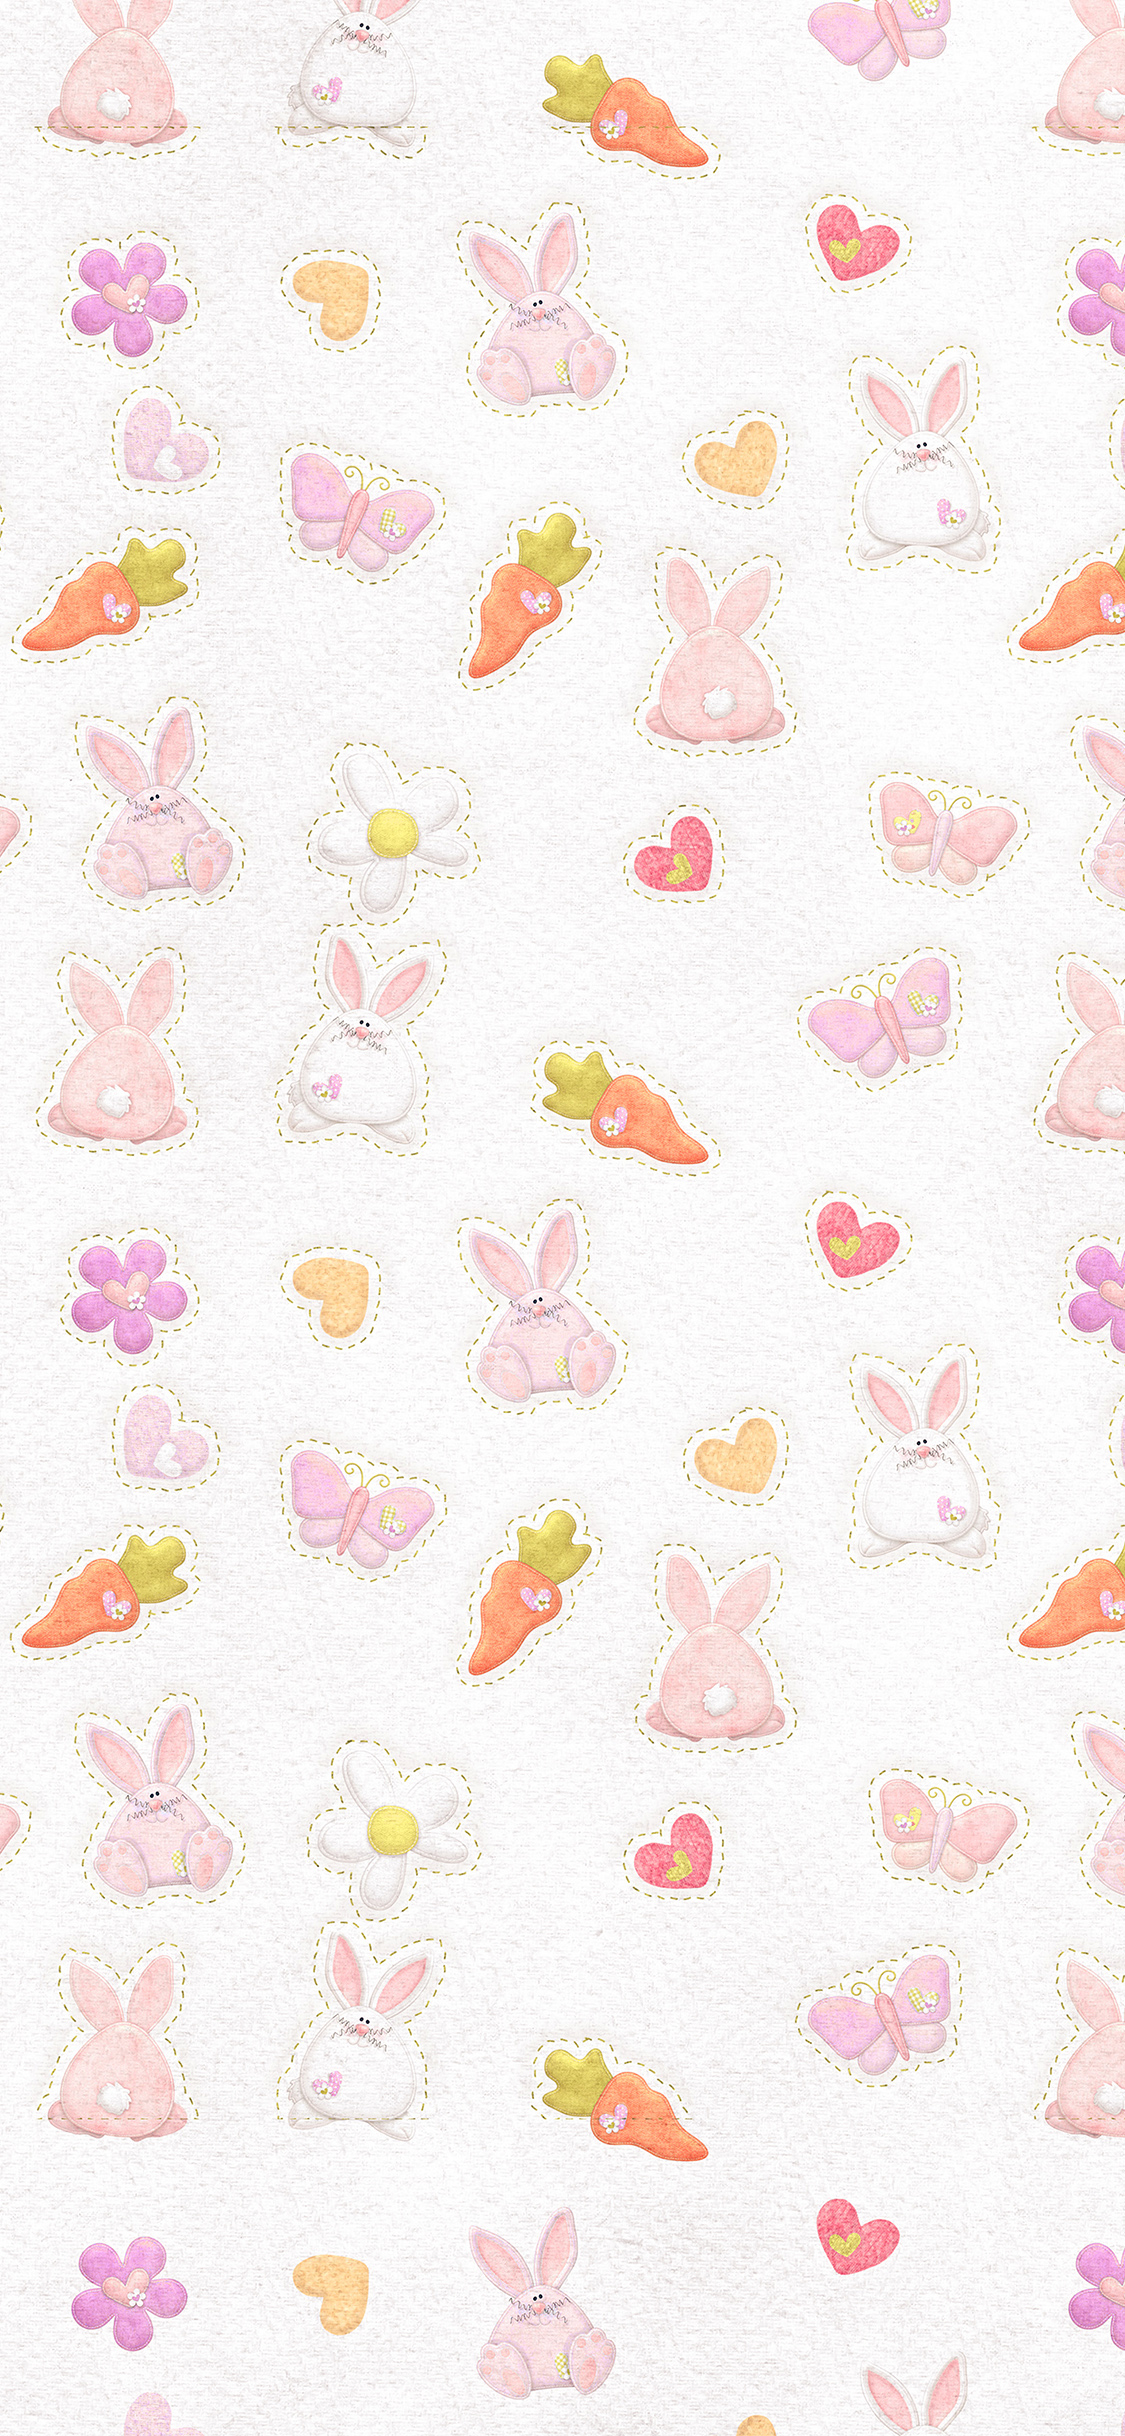 iPhonexpapers.com-Apple-iPhone-wallpaper-vp06-cute-rabbit-chracter-pattern-red